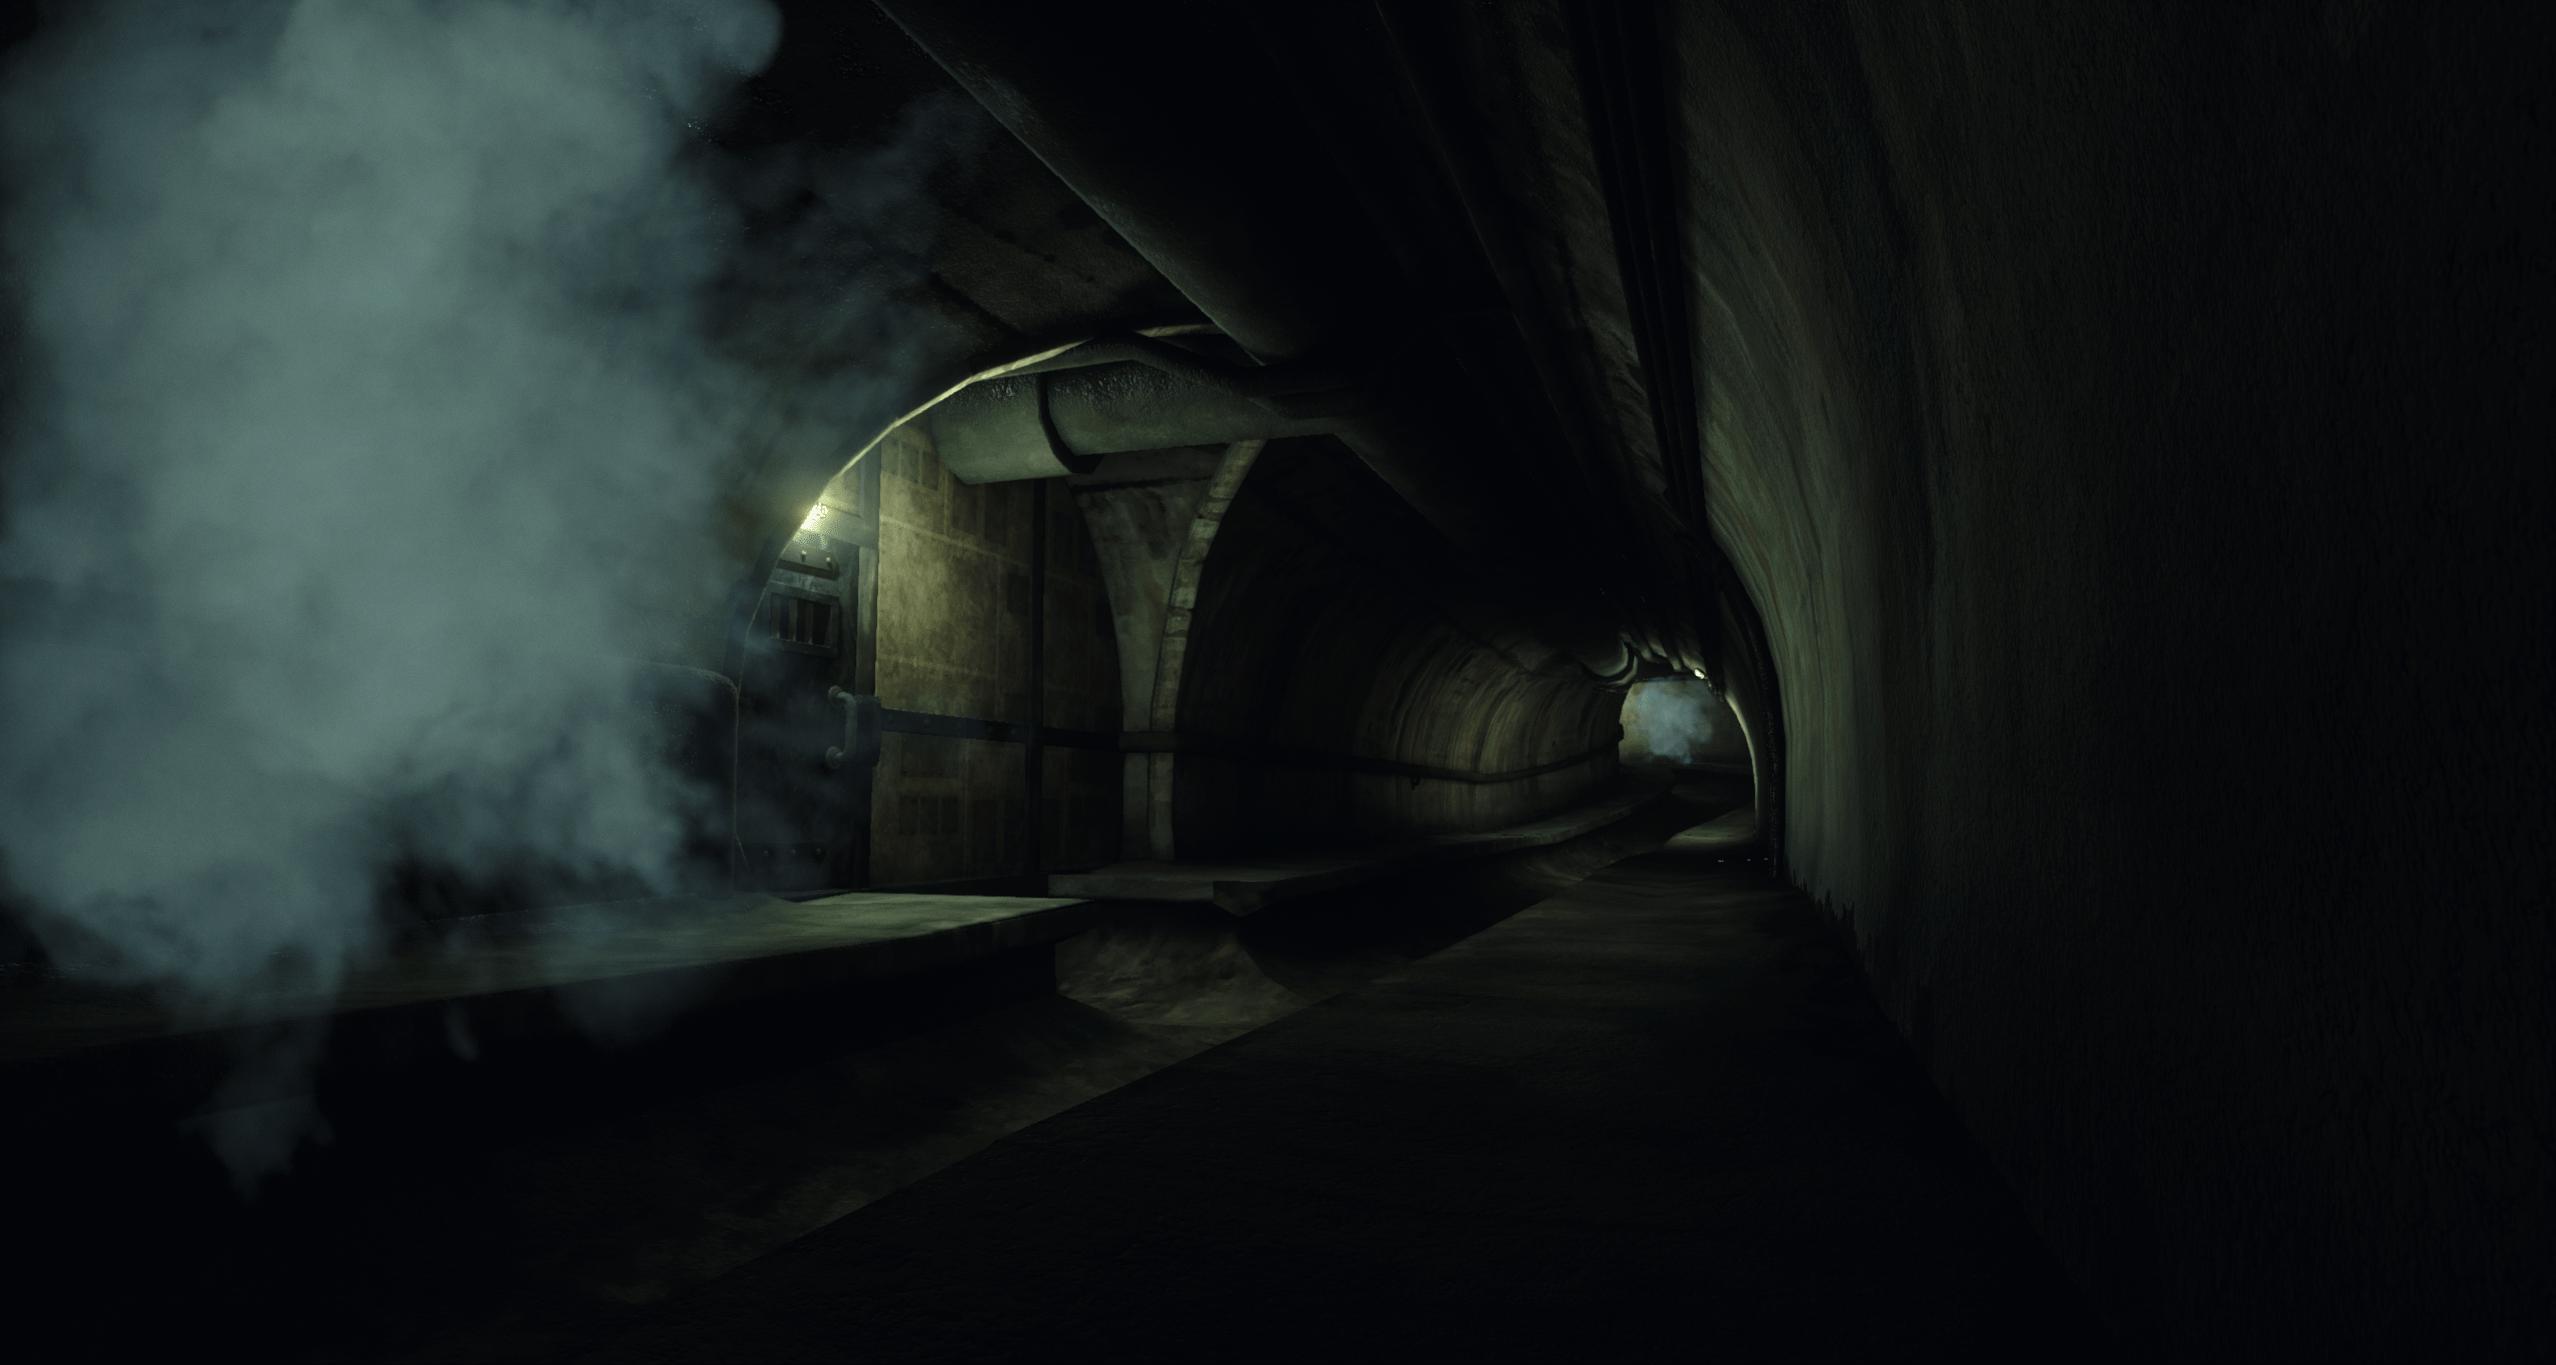 Atlas Park sewers